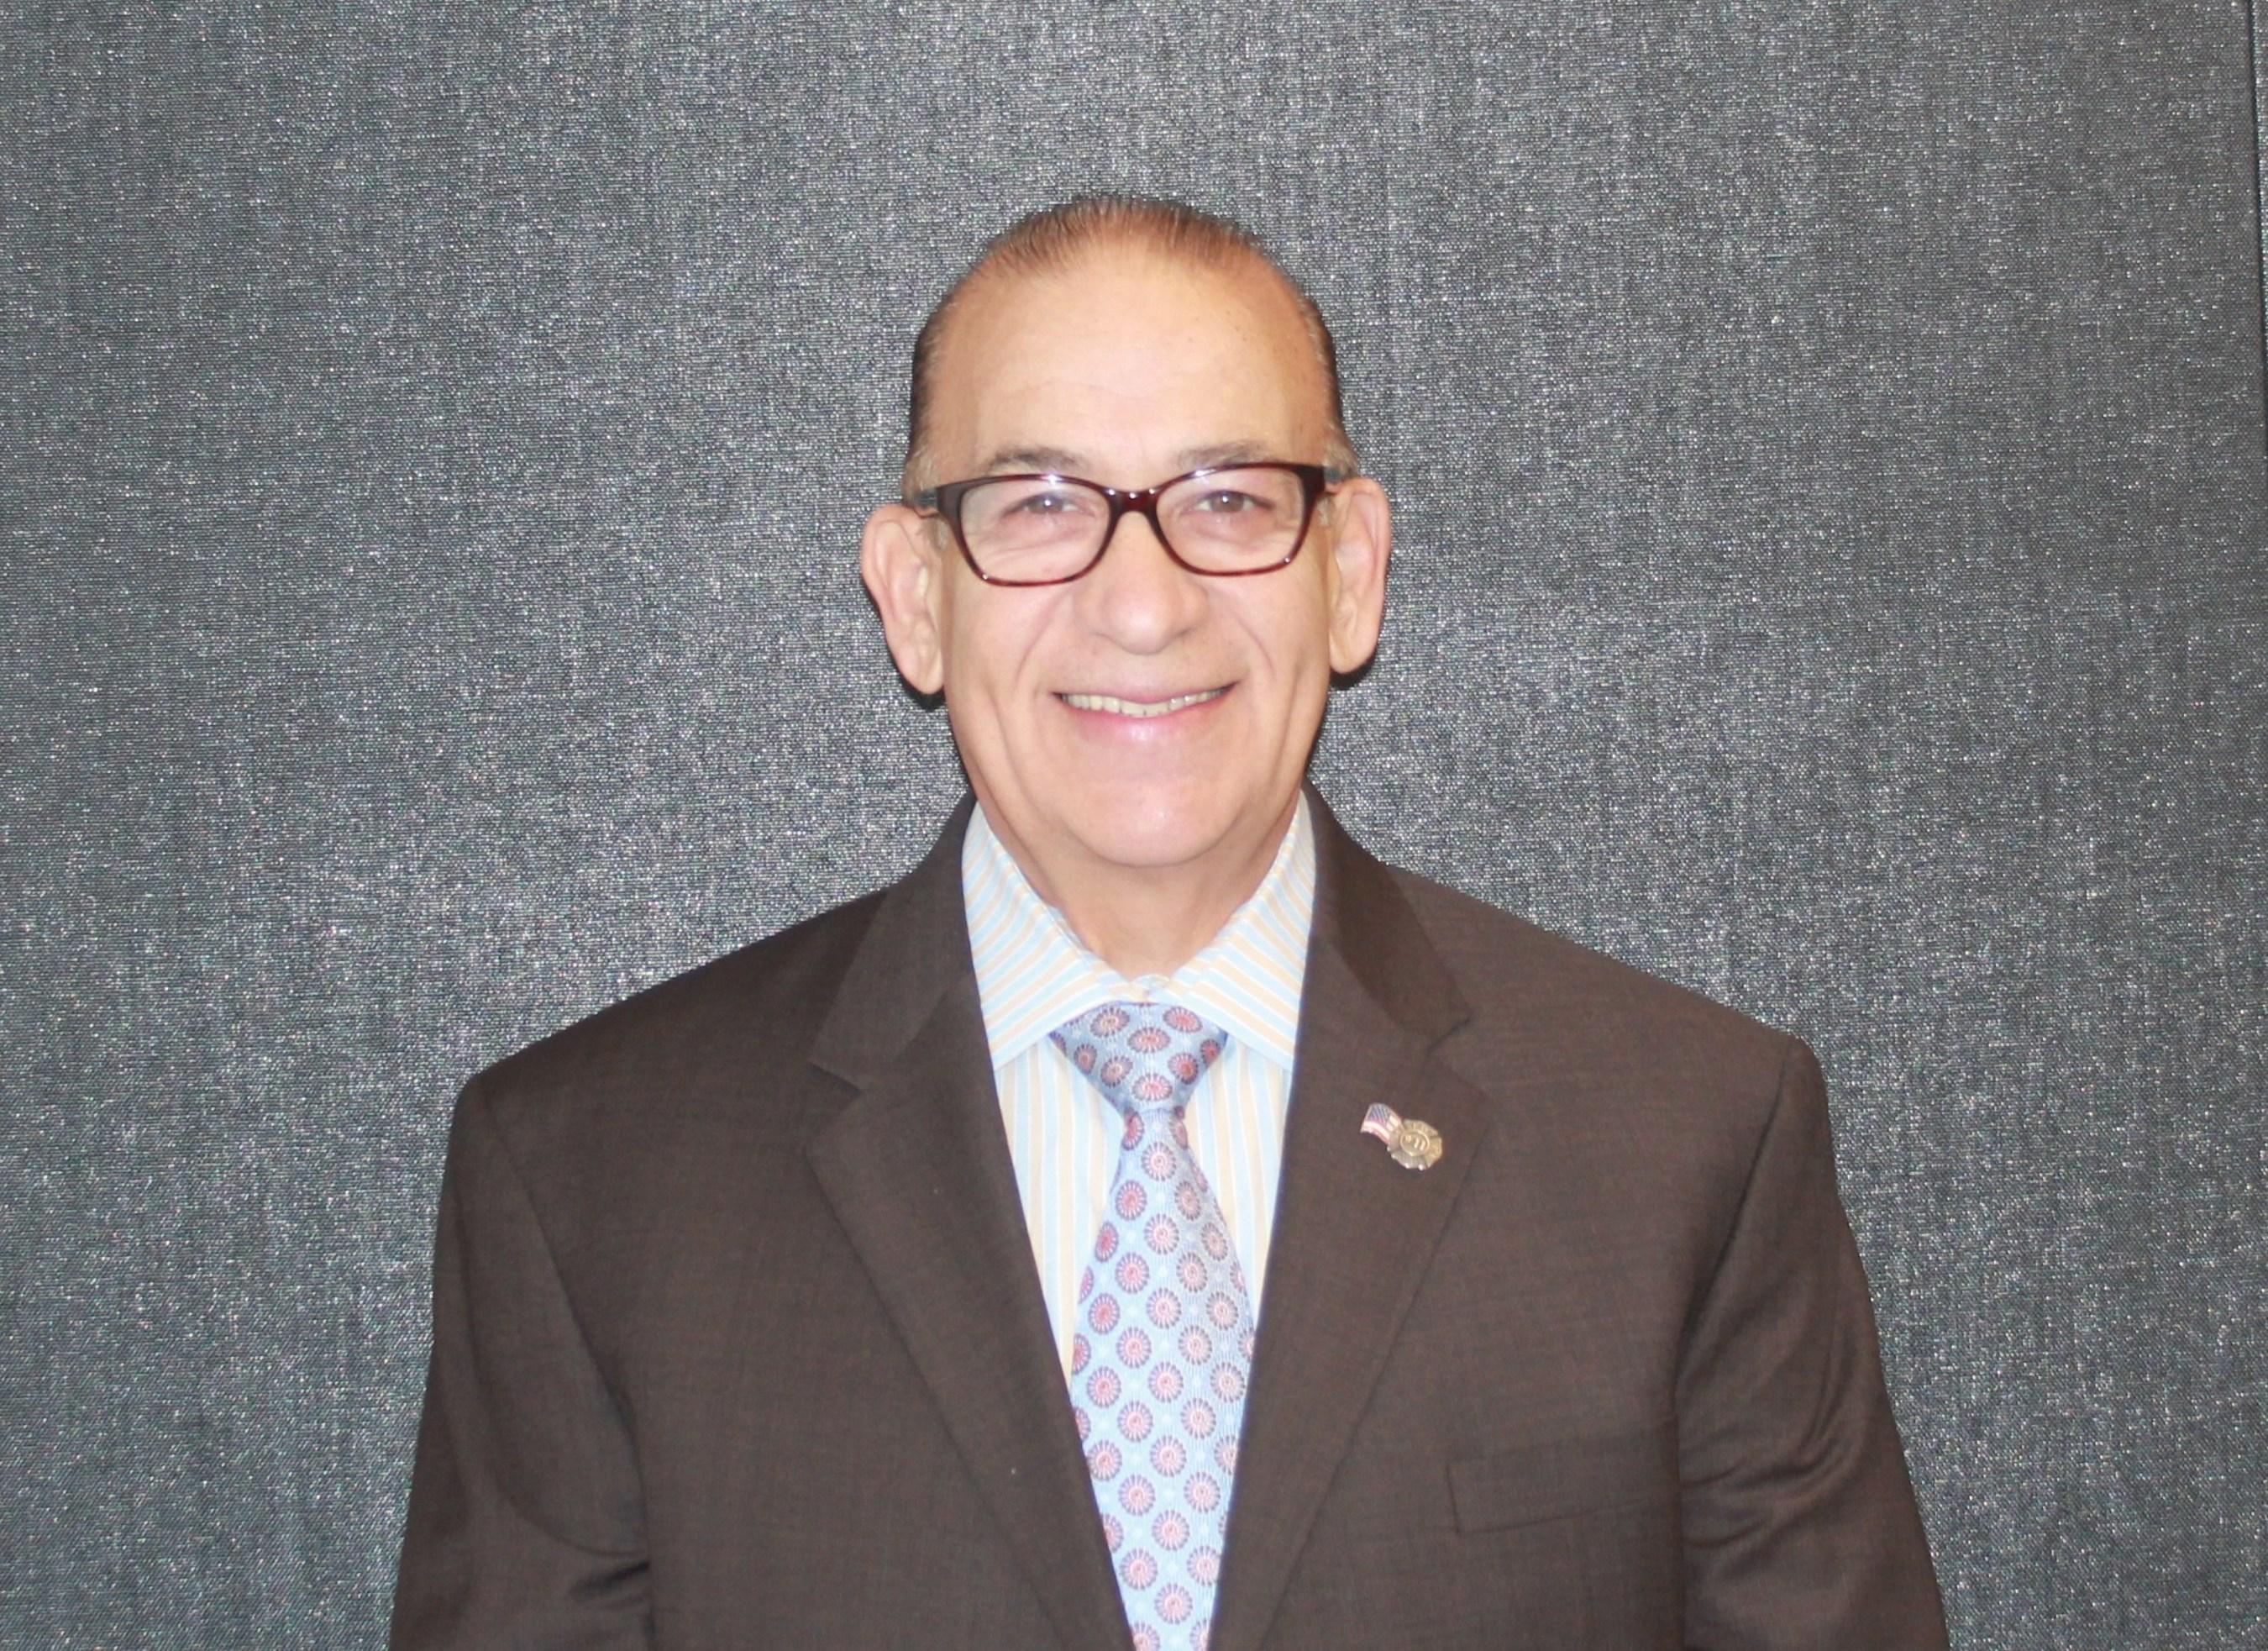 Amerlux appoints John Mamo VP of Global Sales